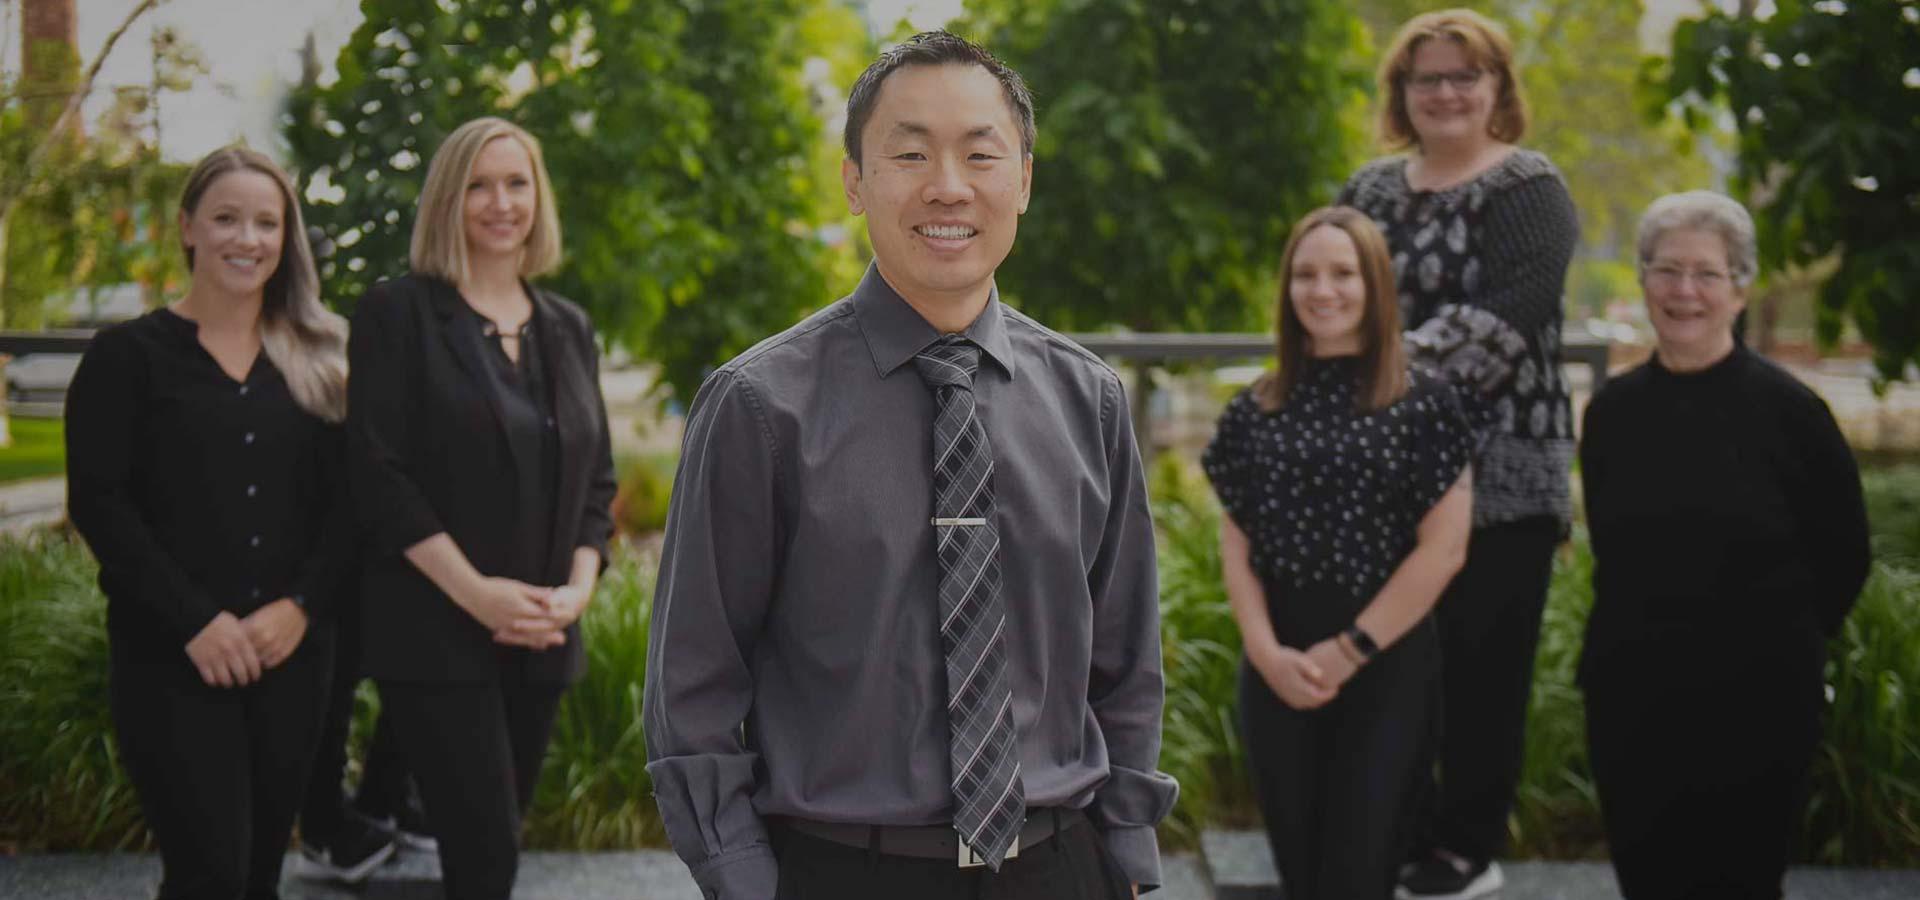 Meet the Friendly Dental Team   Canterra Dental Centre   Downtown Calgary   General and Family Dentist